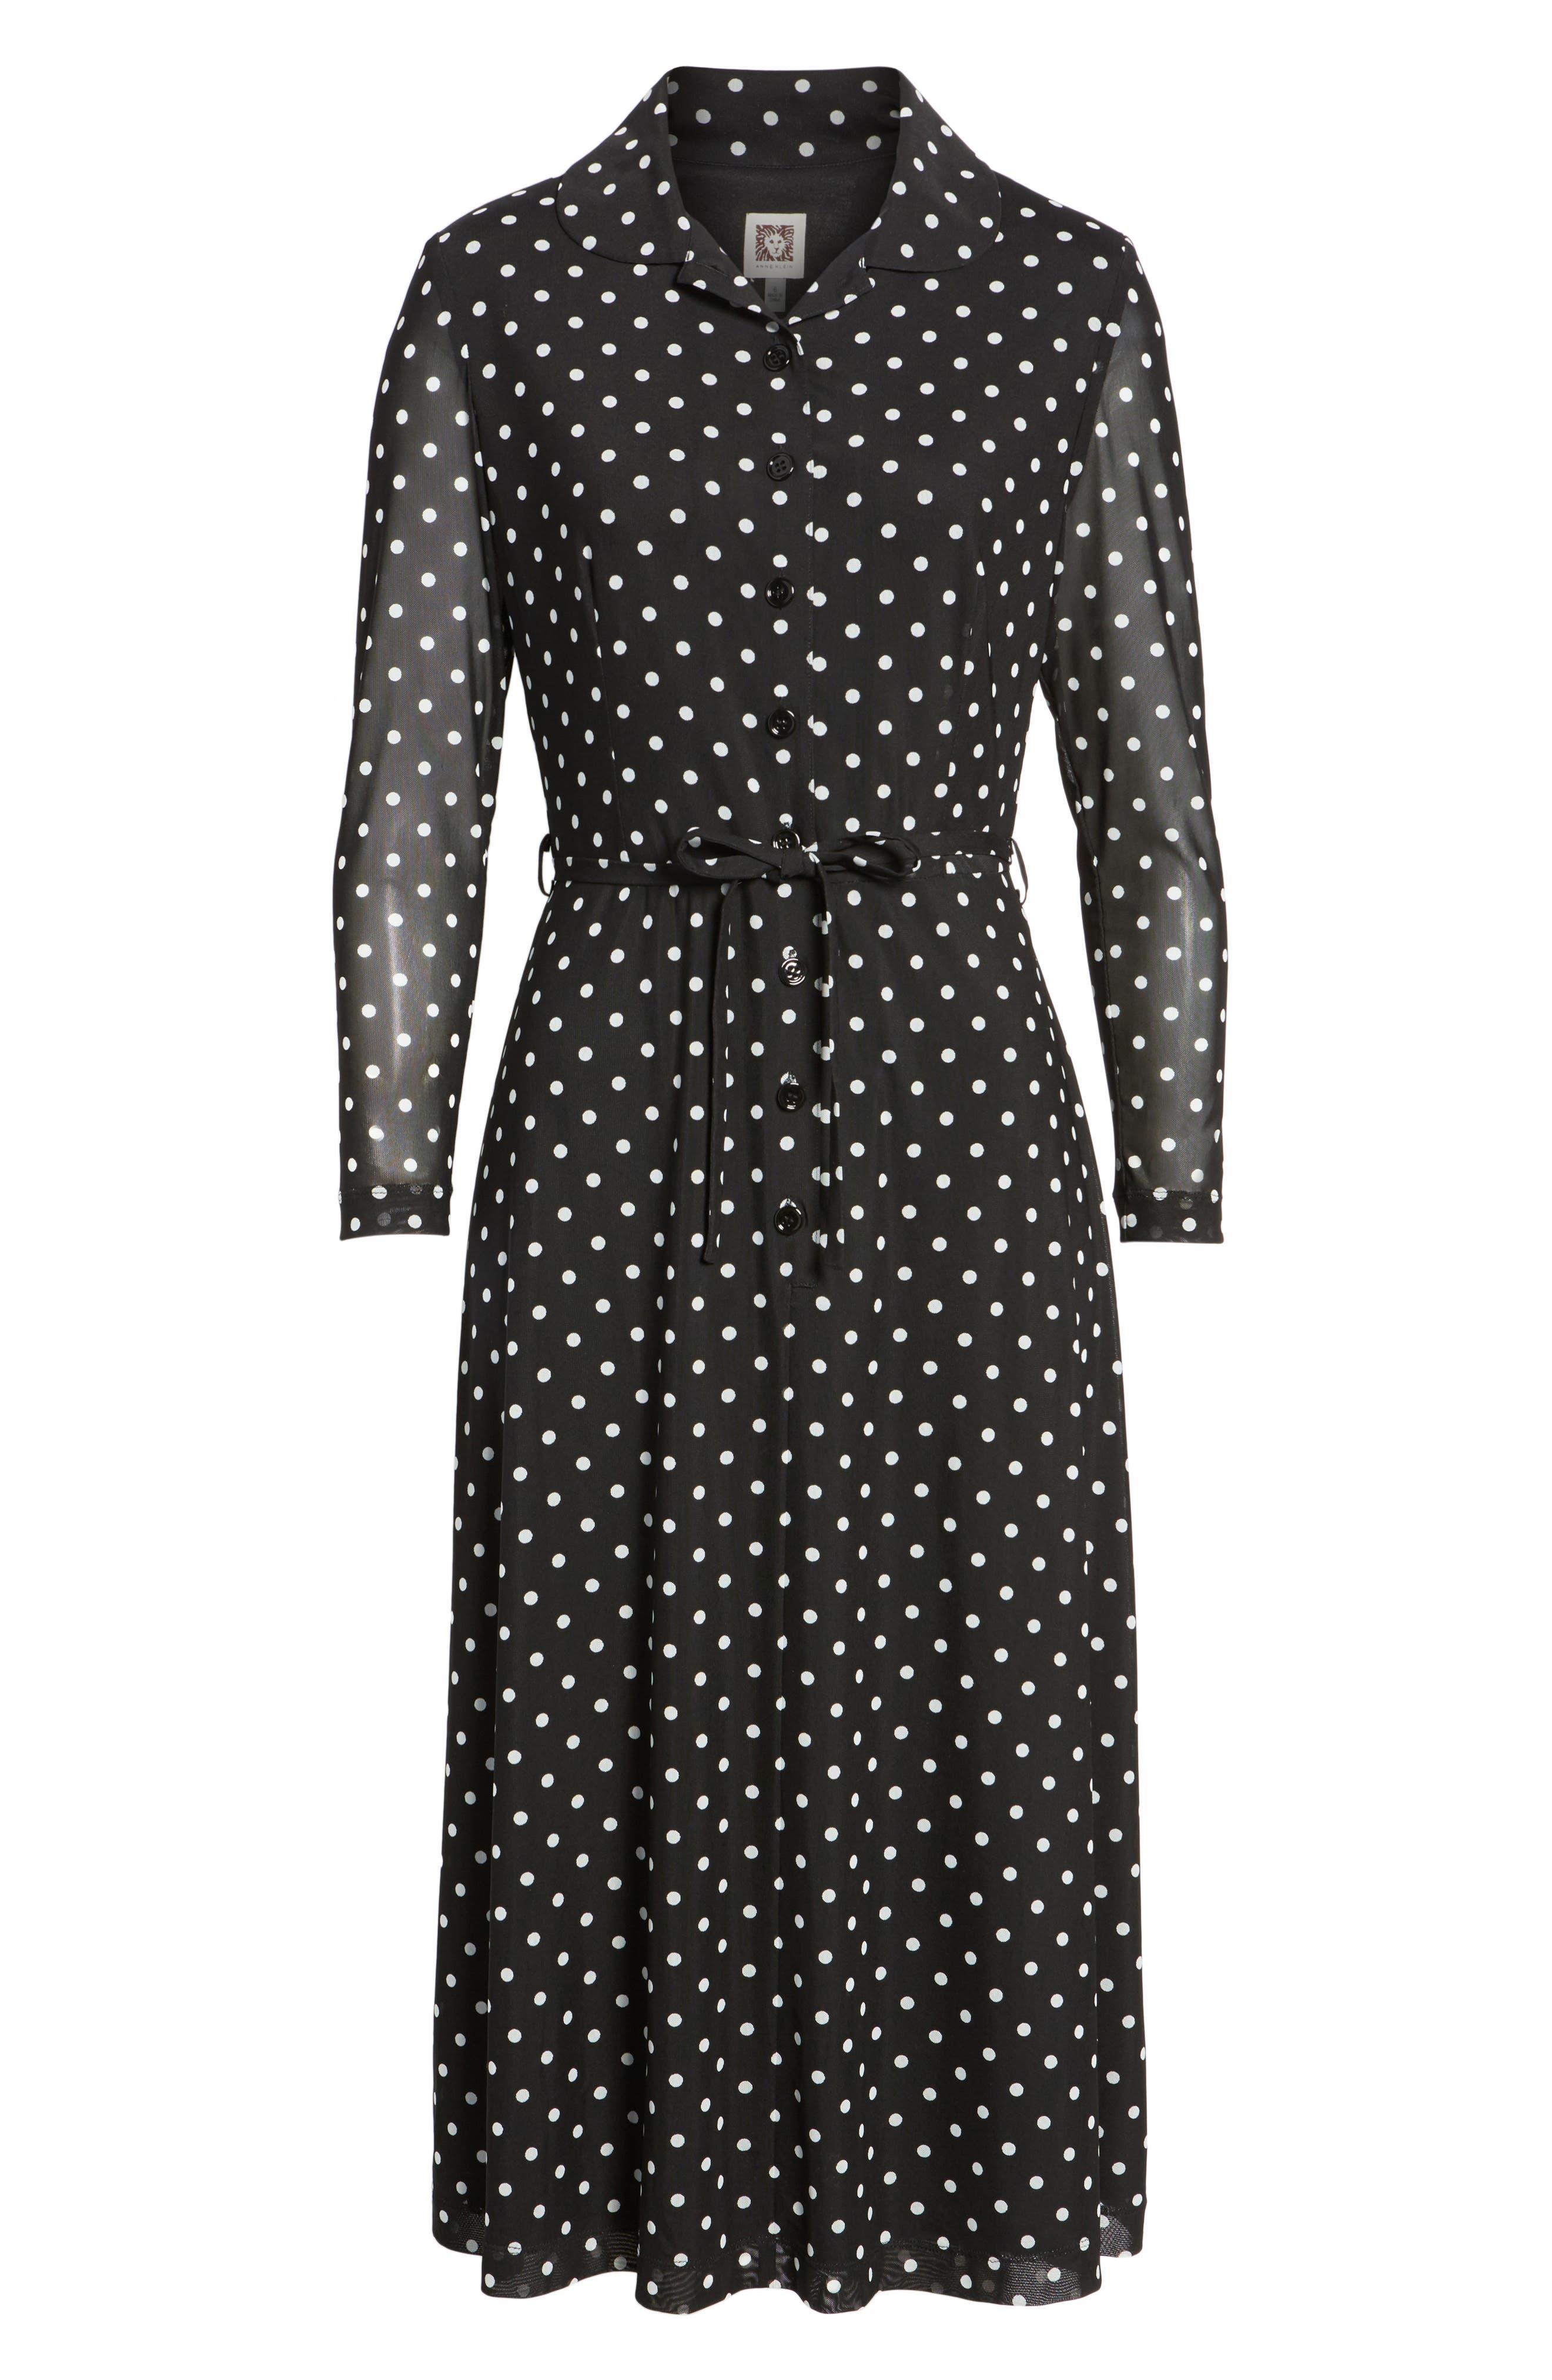 Polka Dot Shirt Dress,                             Alternate thumbnail 6, color,                             Black/ White